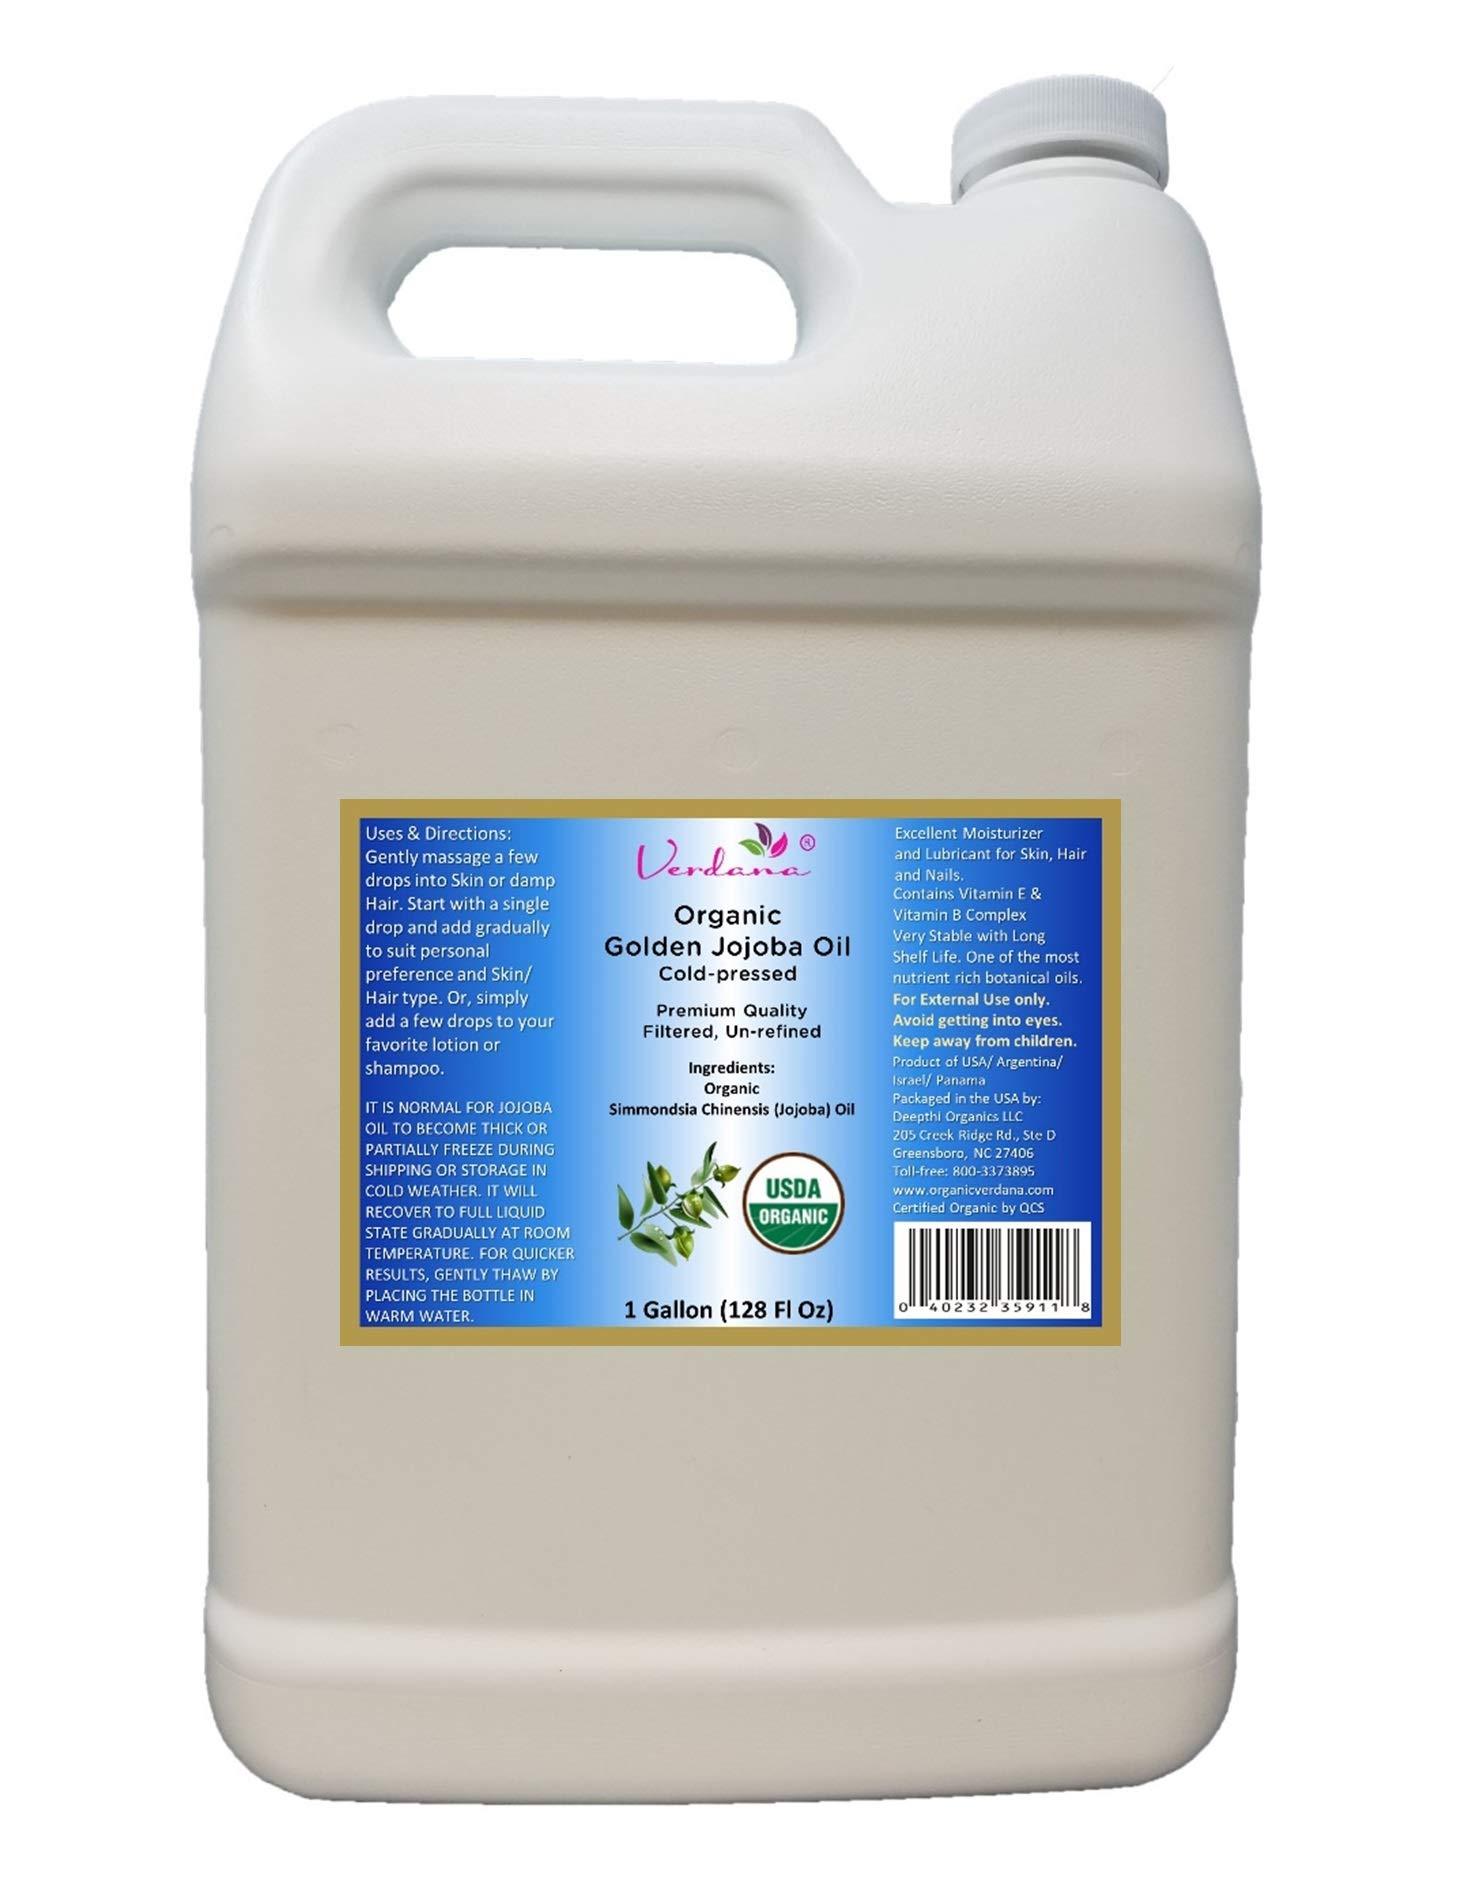 Organic Verdana USDA Certified Organic Golden Jojoba Oil, Cold Pressed, Unrefined, 1 Gallon Bulk size - Deepthi Organics